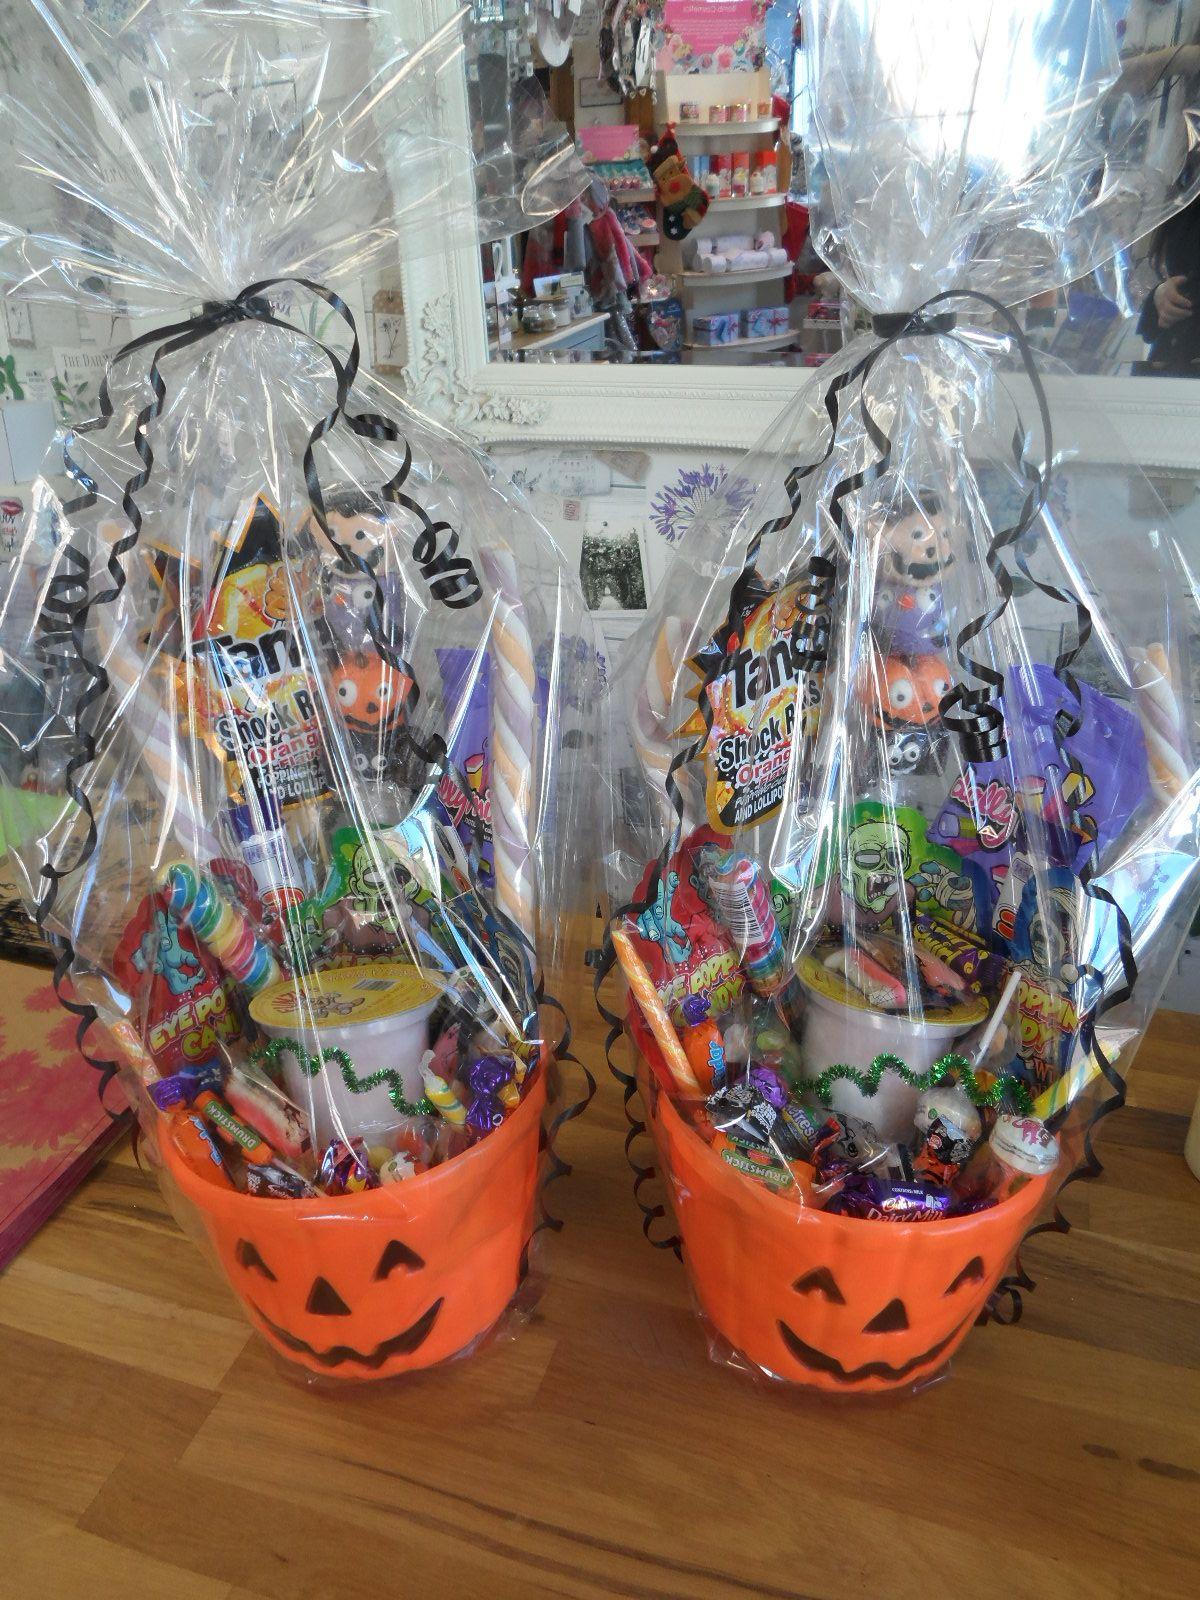 Halloween treat gift baskets